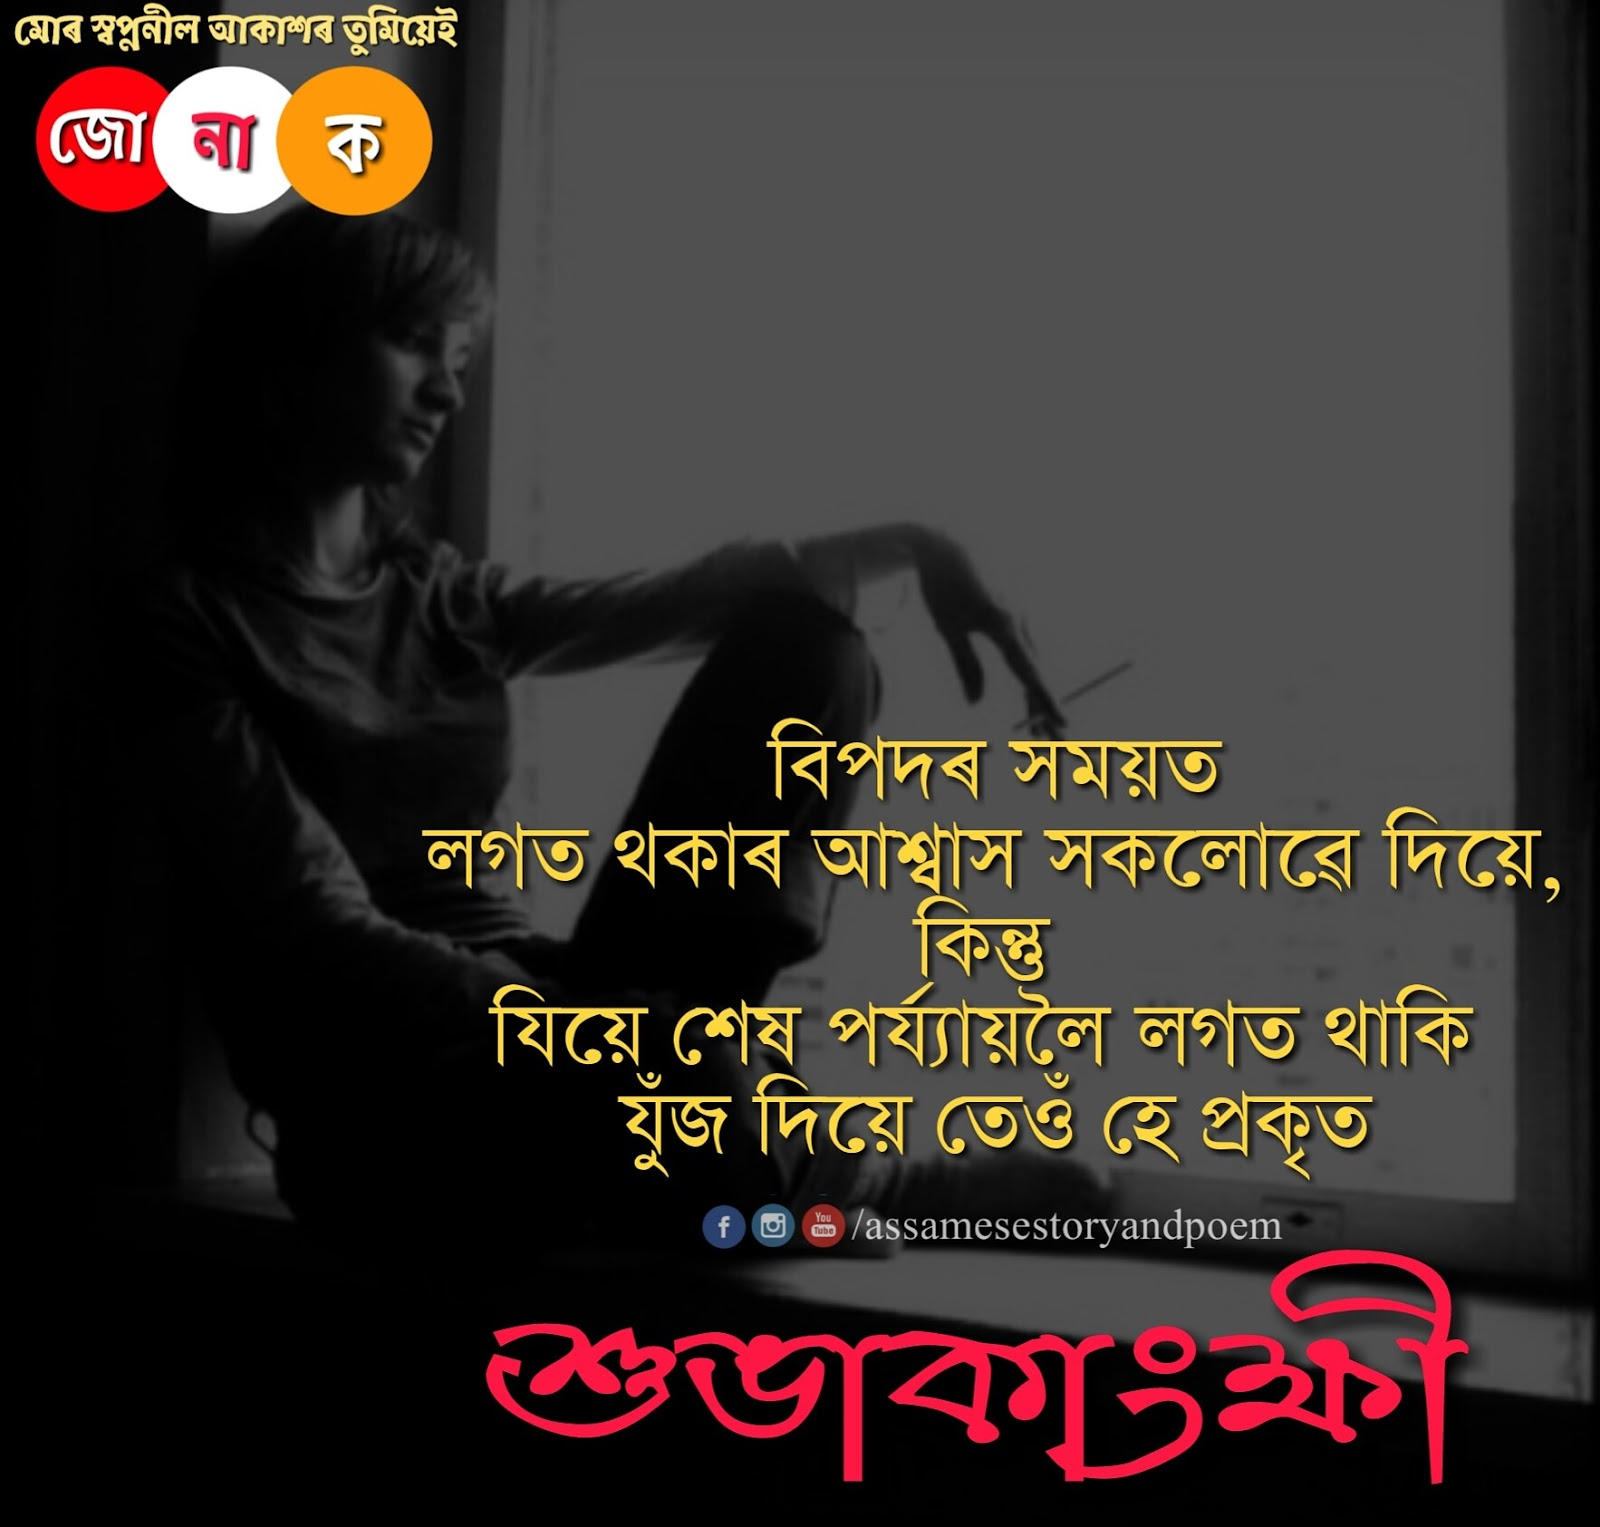 Assamese Sad Quotes, Shayari, SMS for Whatsapp, Facebook